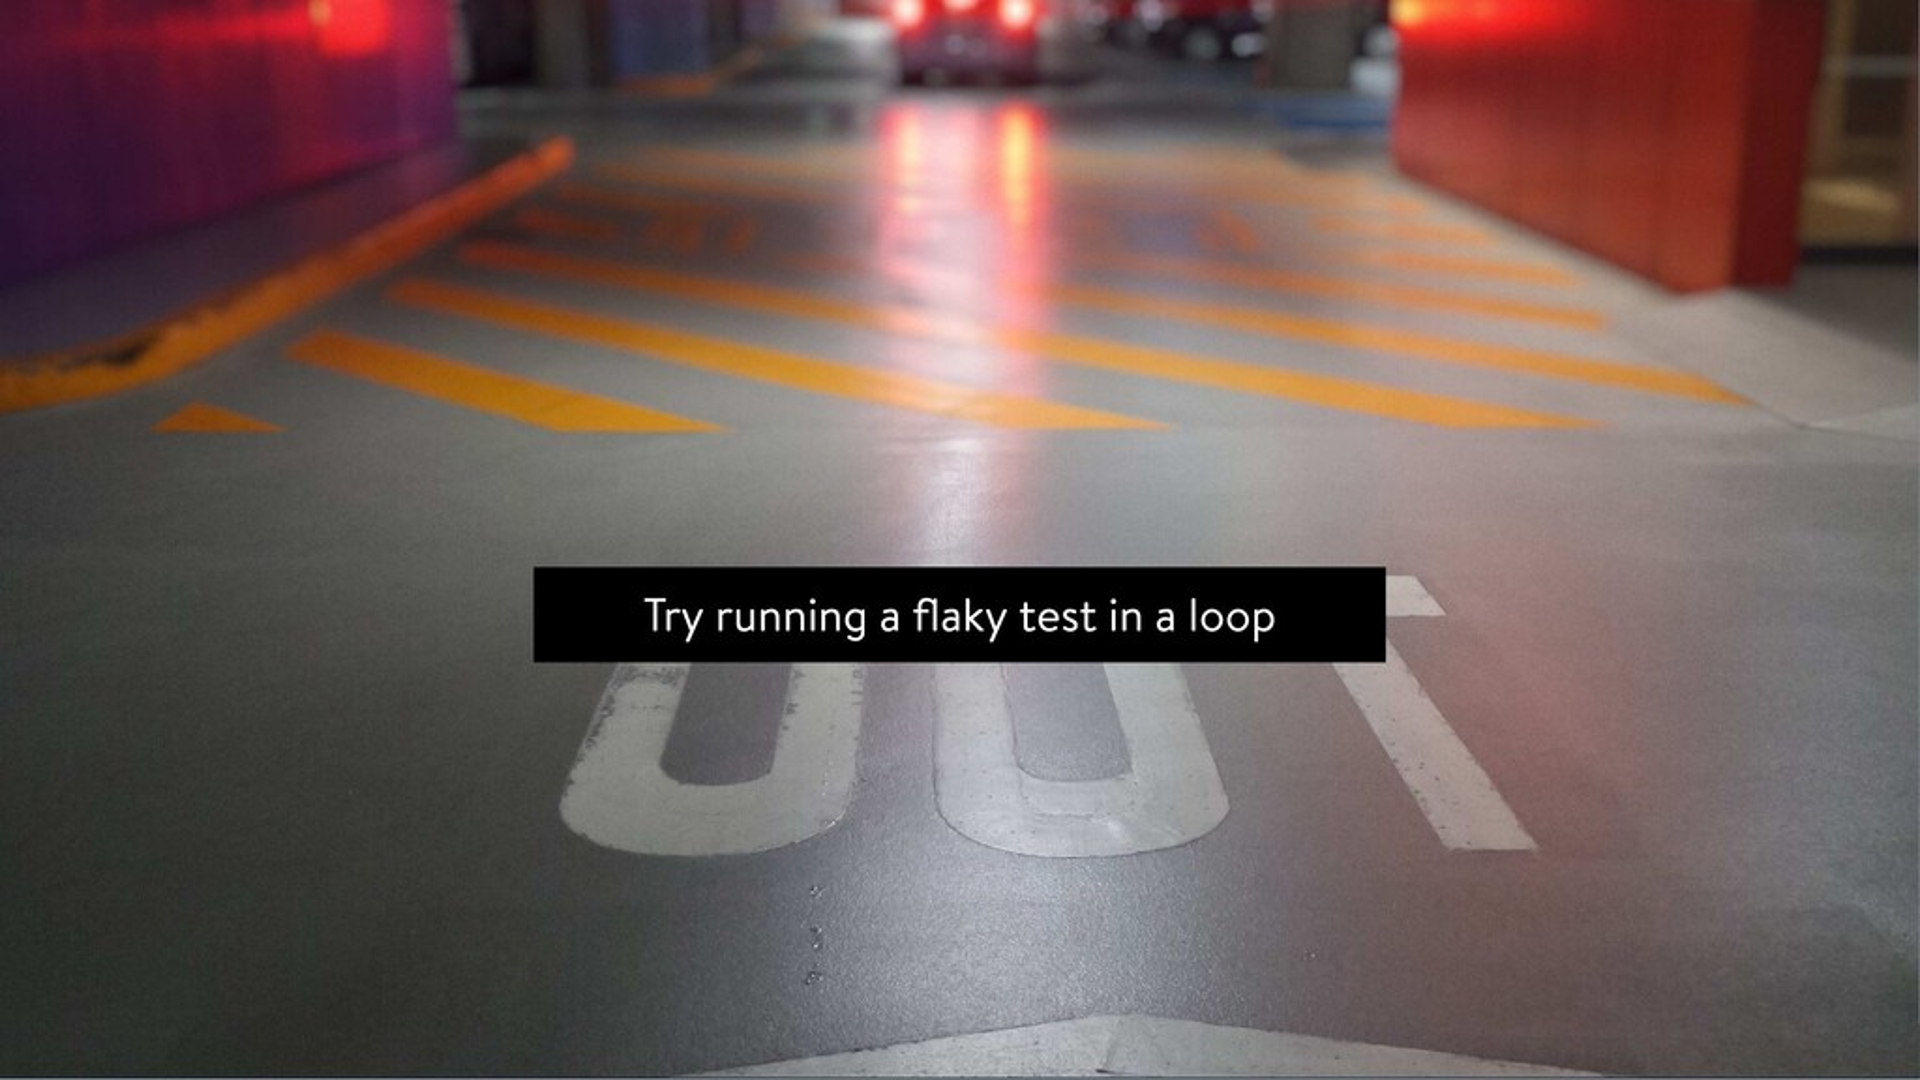 Flaky tests - Fighting nightmares @leichteckig ...